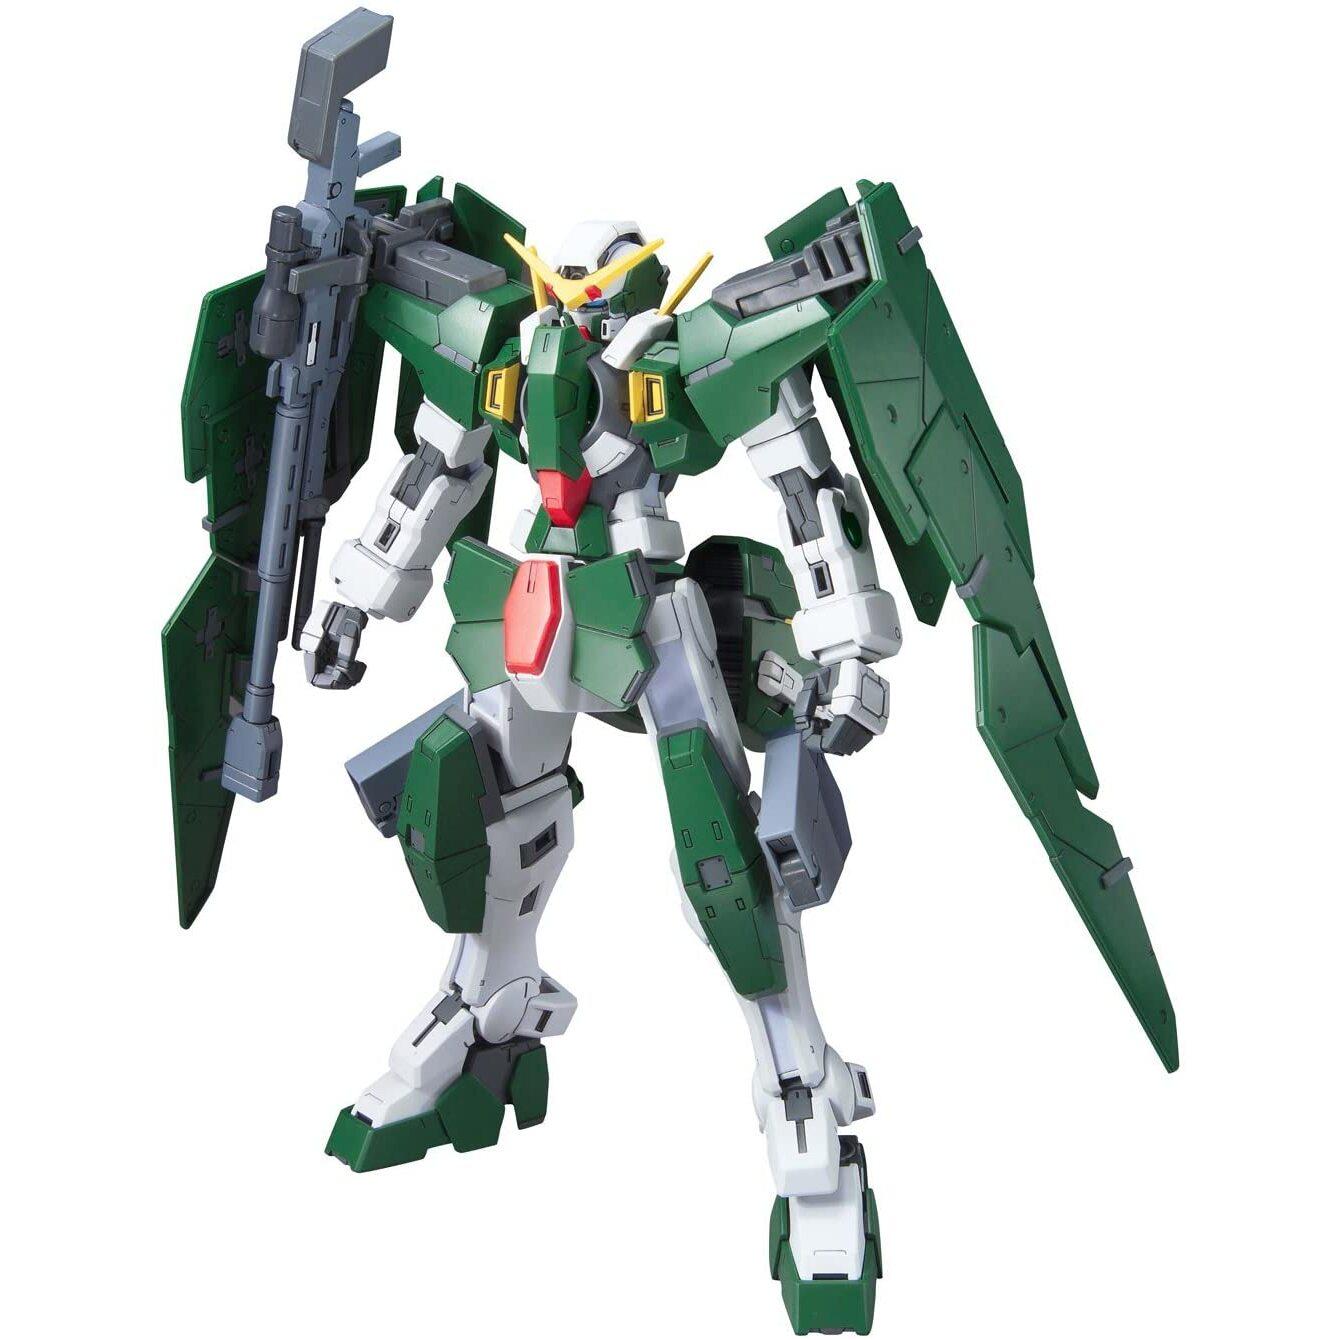 GN-002 Gundam Dynames Gundam 00 MG 1100 Scale Model Kit (1)